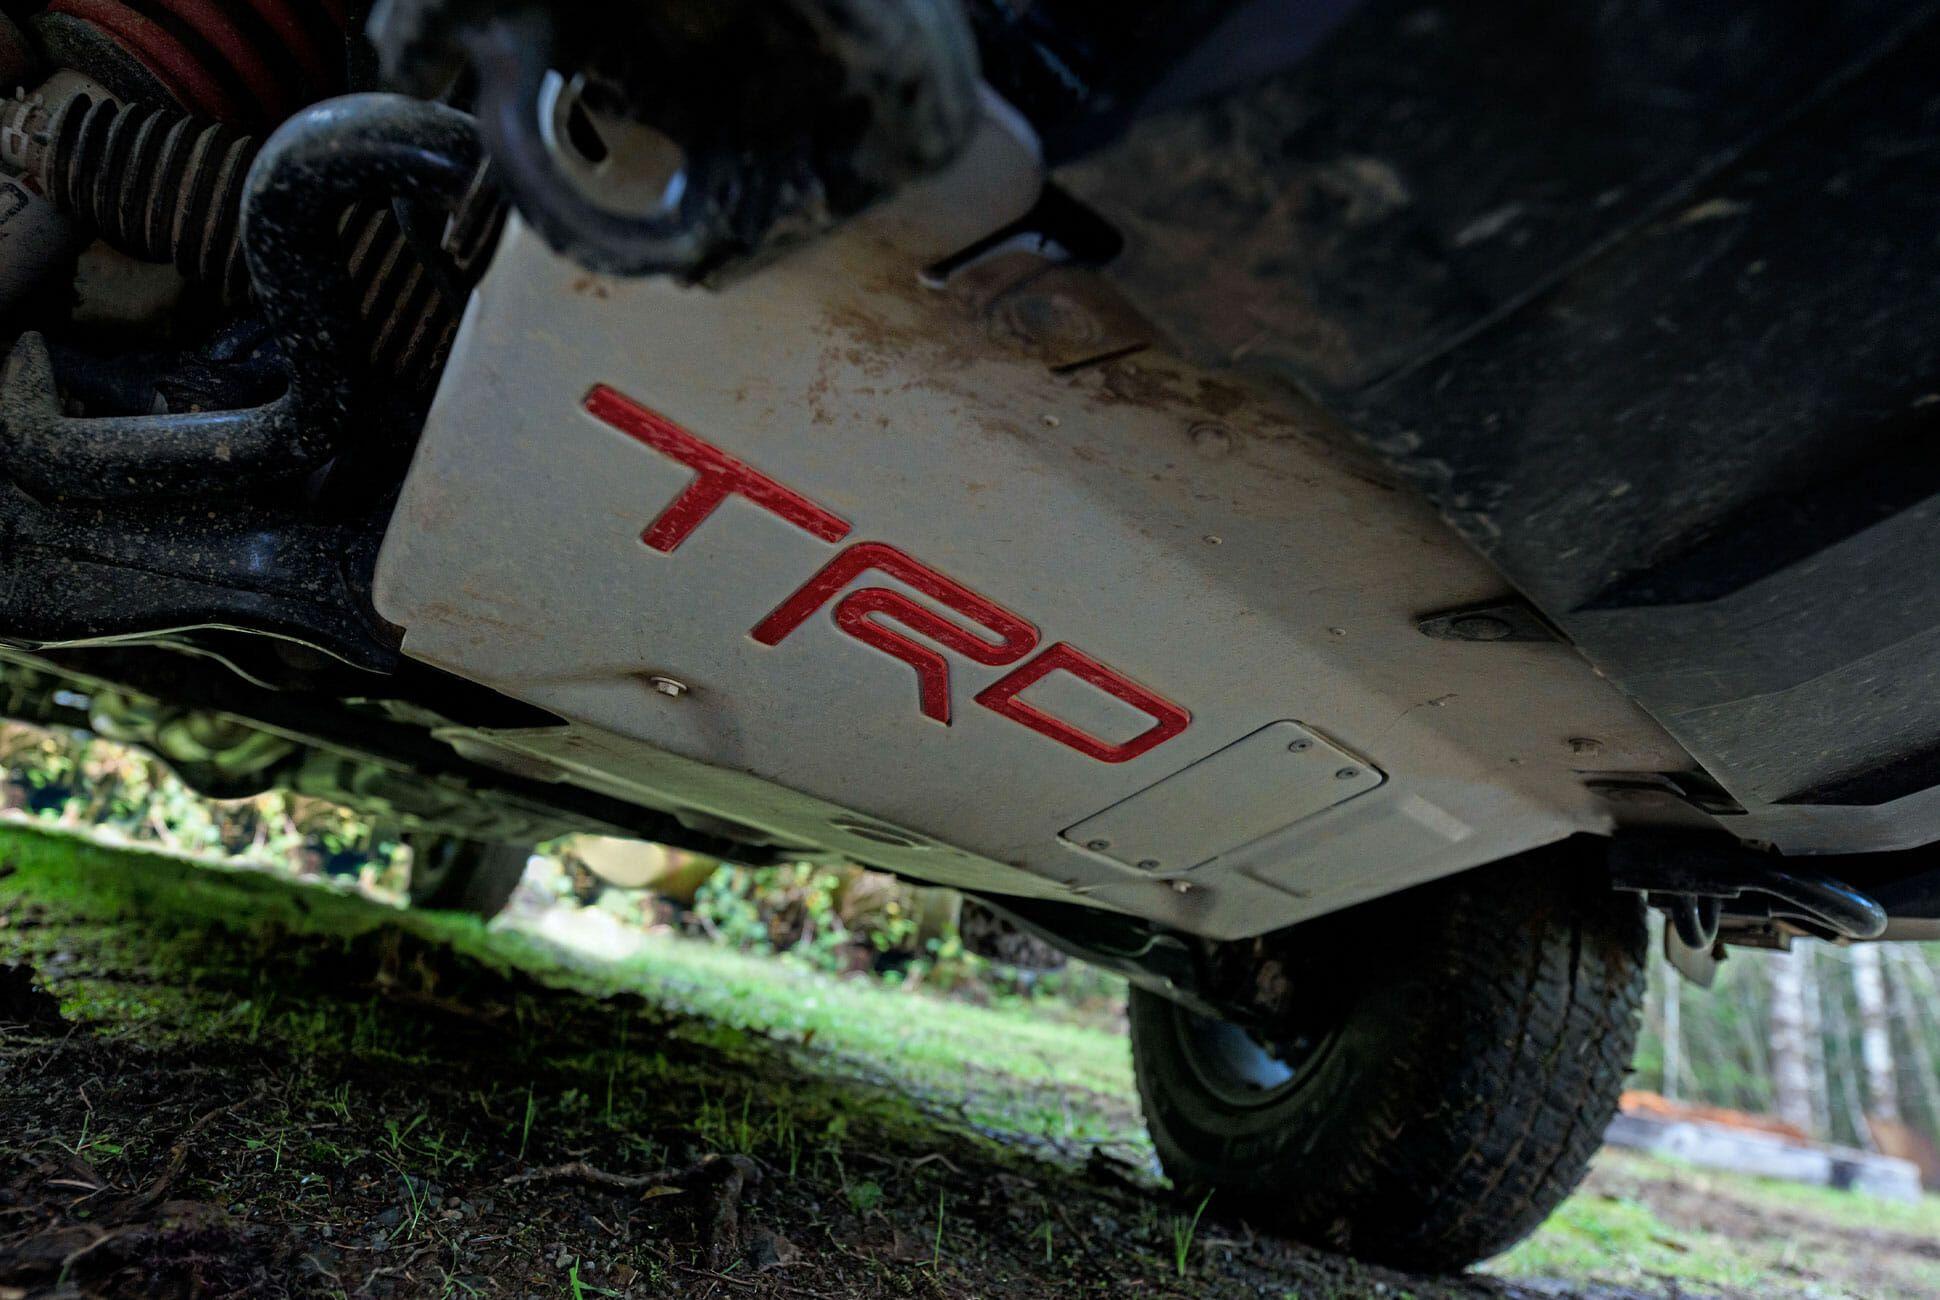 Sequoia-TRD-Gear-Patrol-slide-5